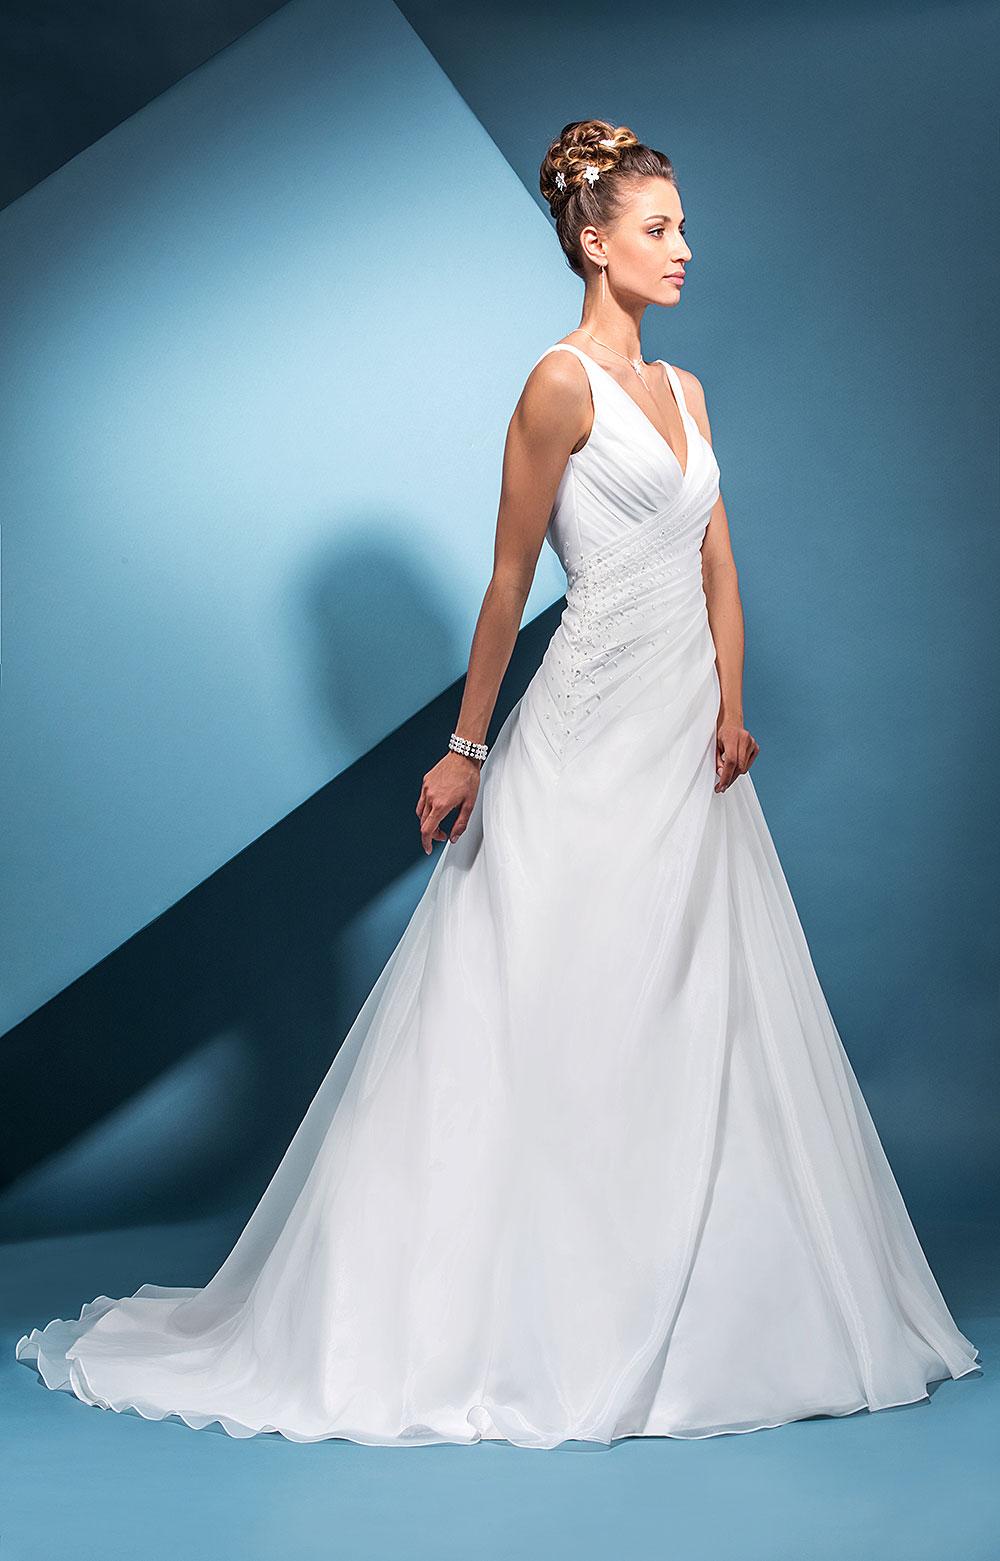 Brautkleider – Seite 6 – Avorio Vestito